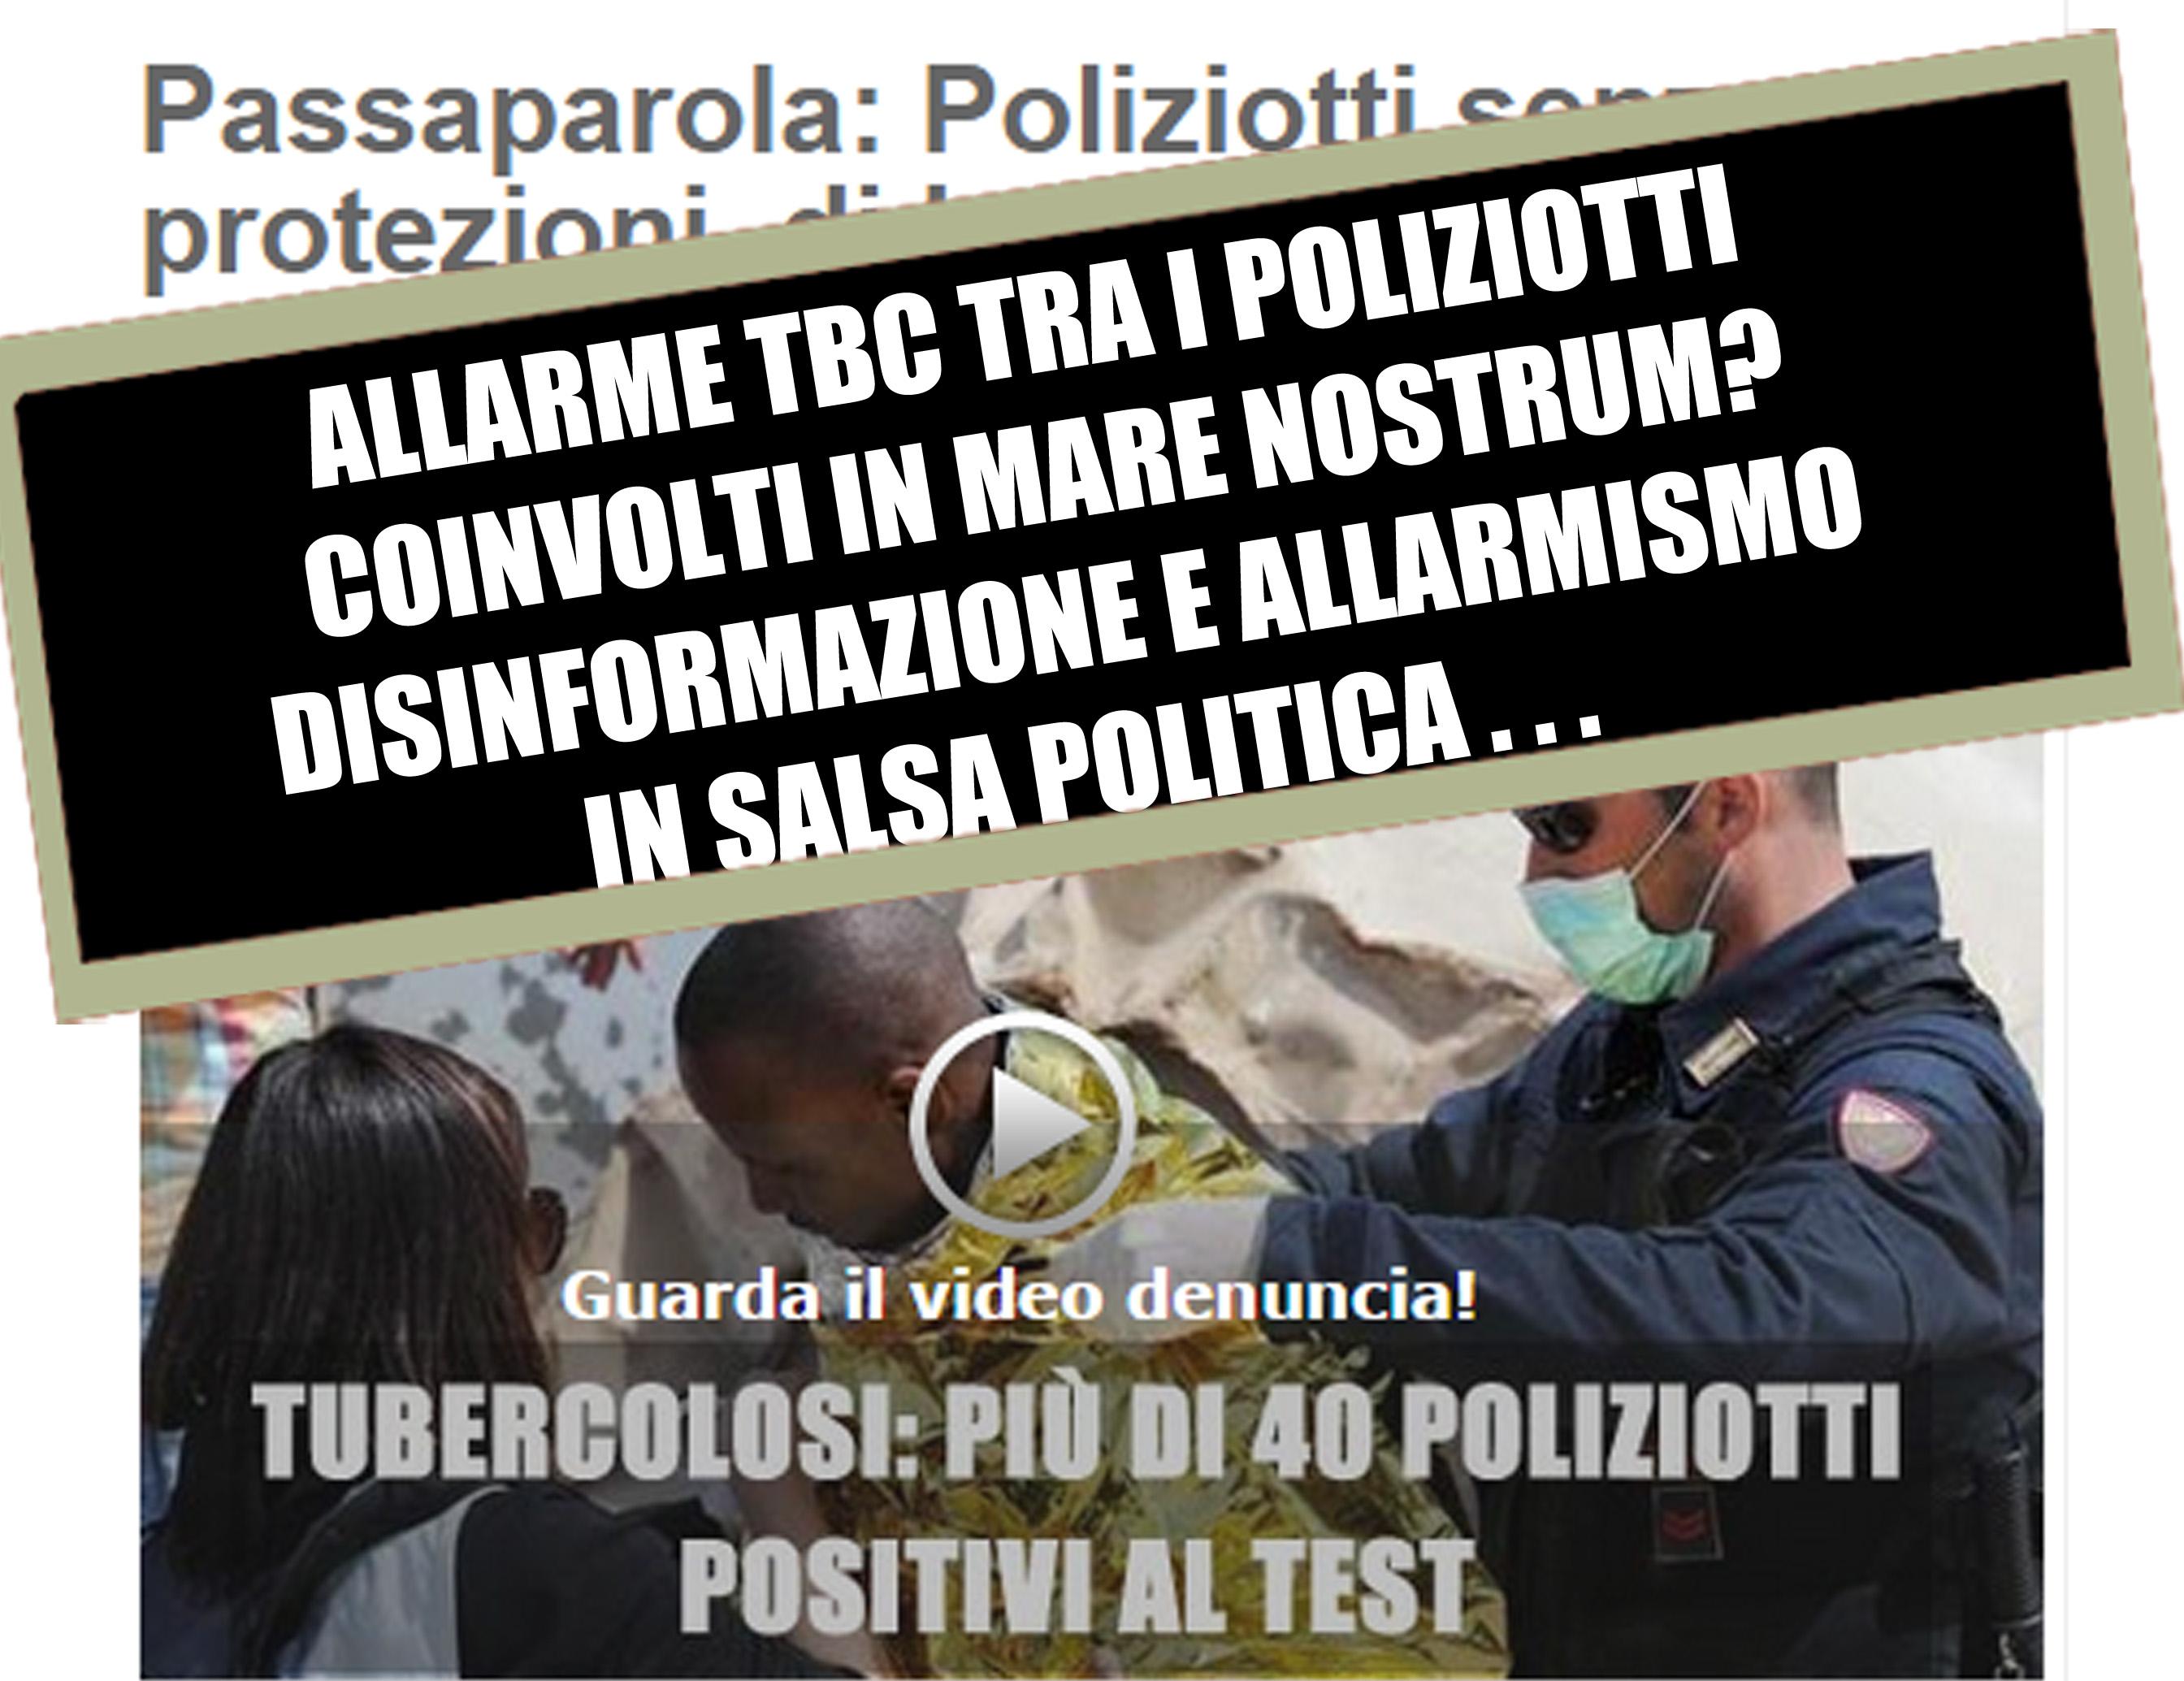 TBCCONSAP